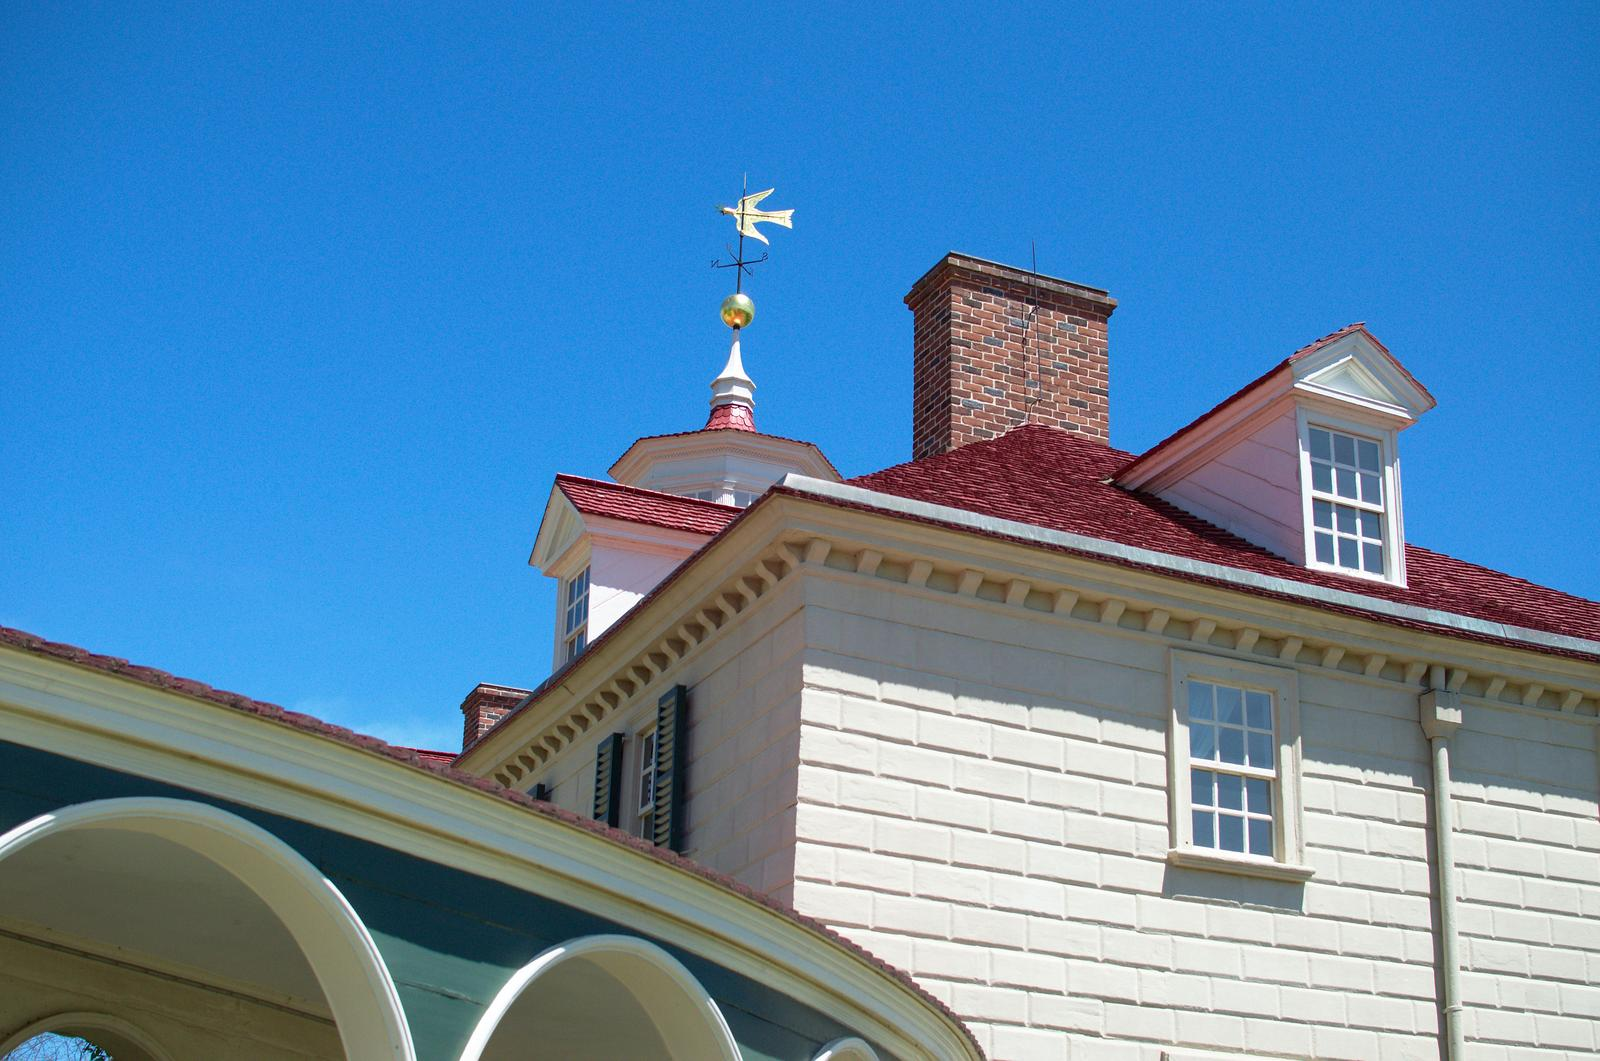 Флюгер в виде ласточки на крыше